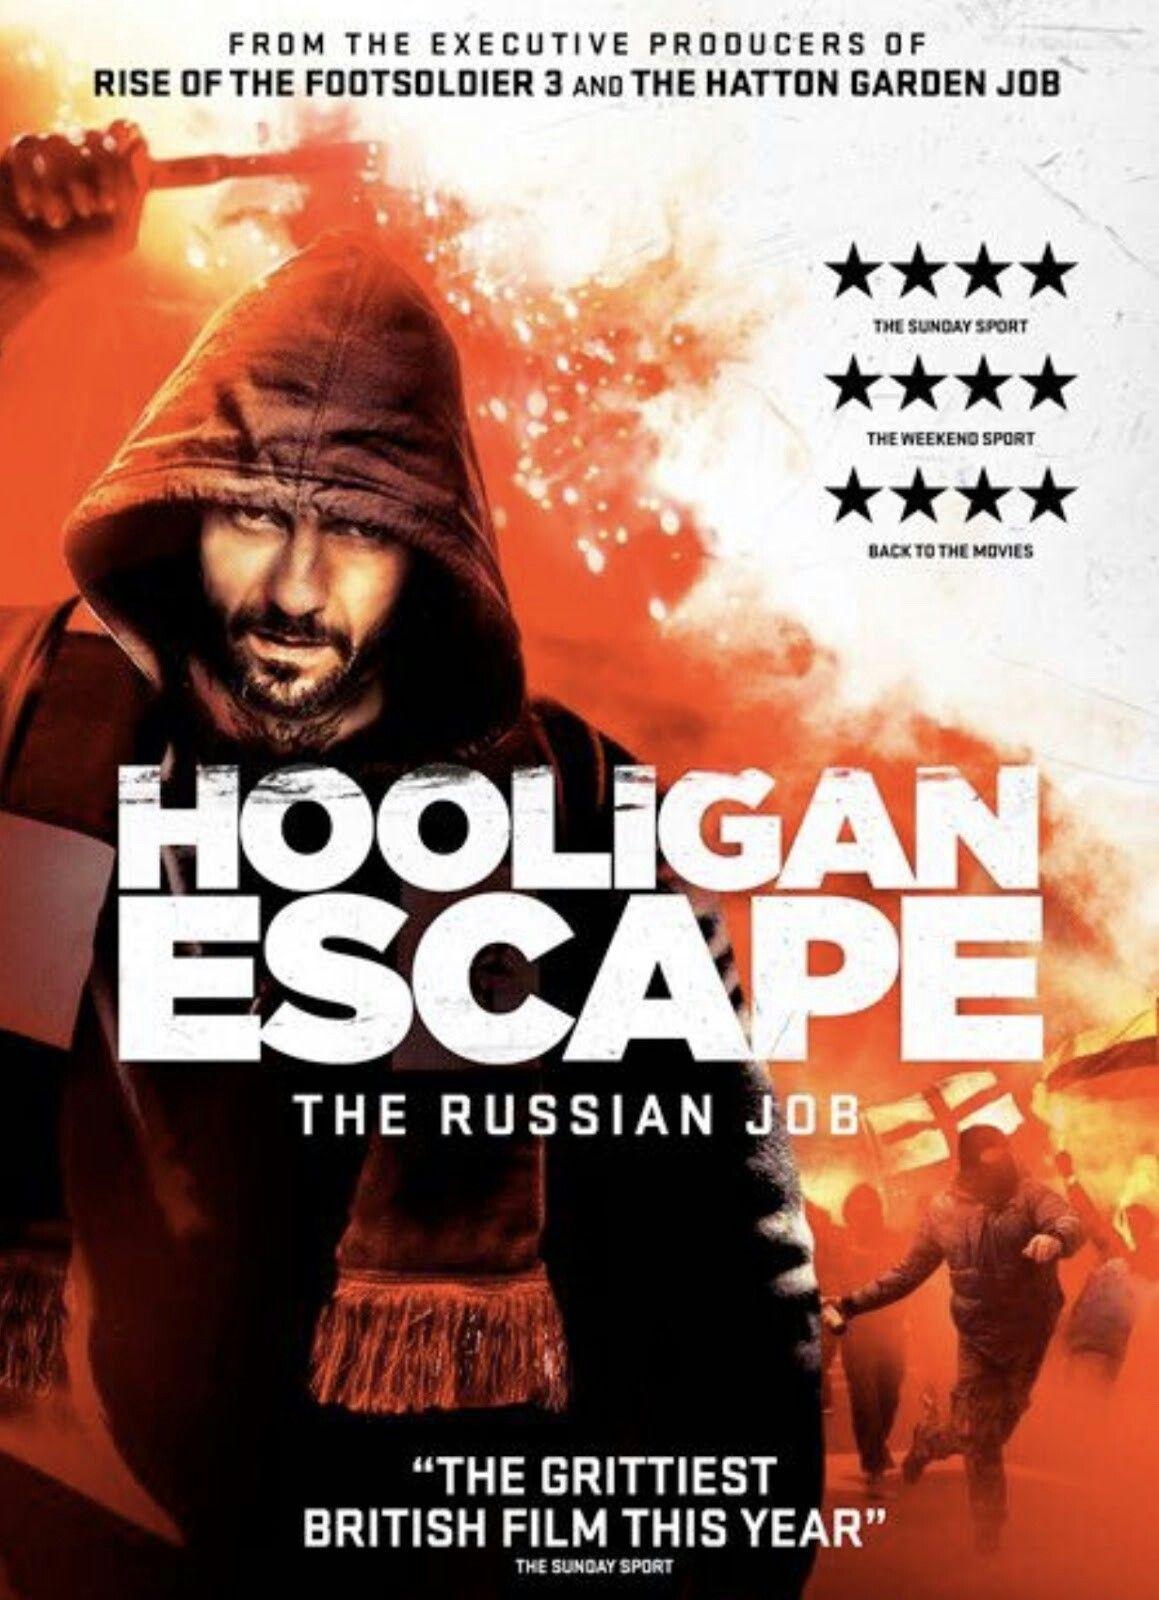 Nonton film hooligan escape the russian job 2018 full hd subtitle indonesia